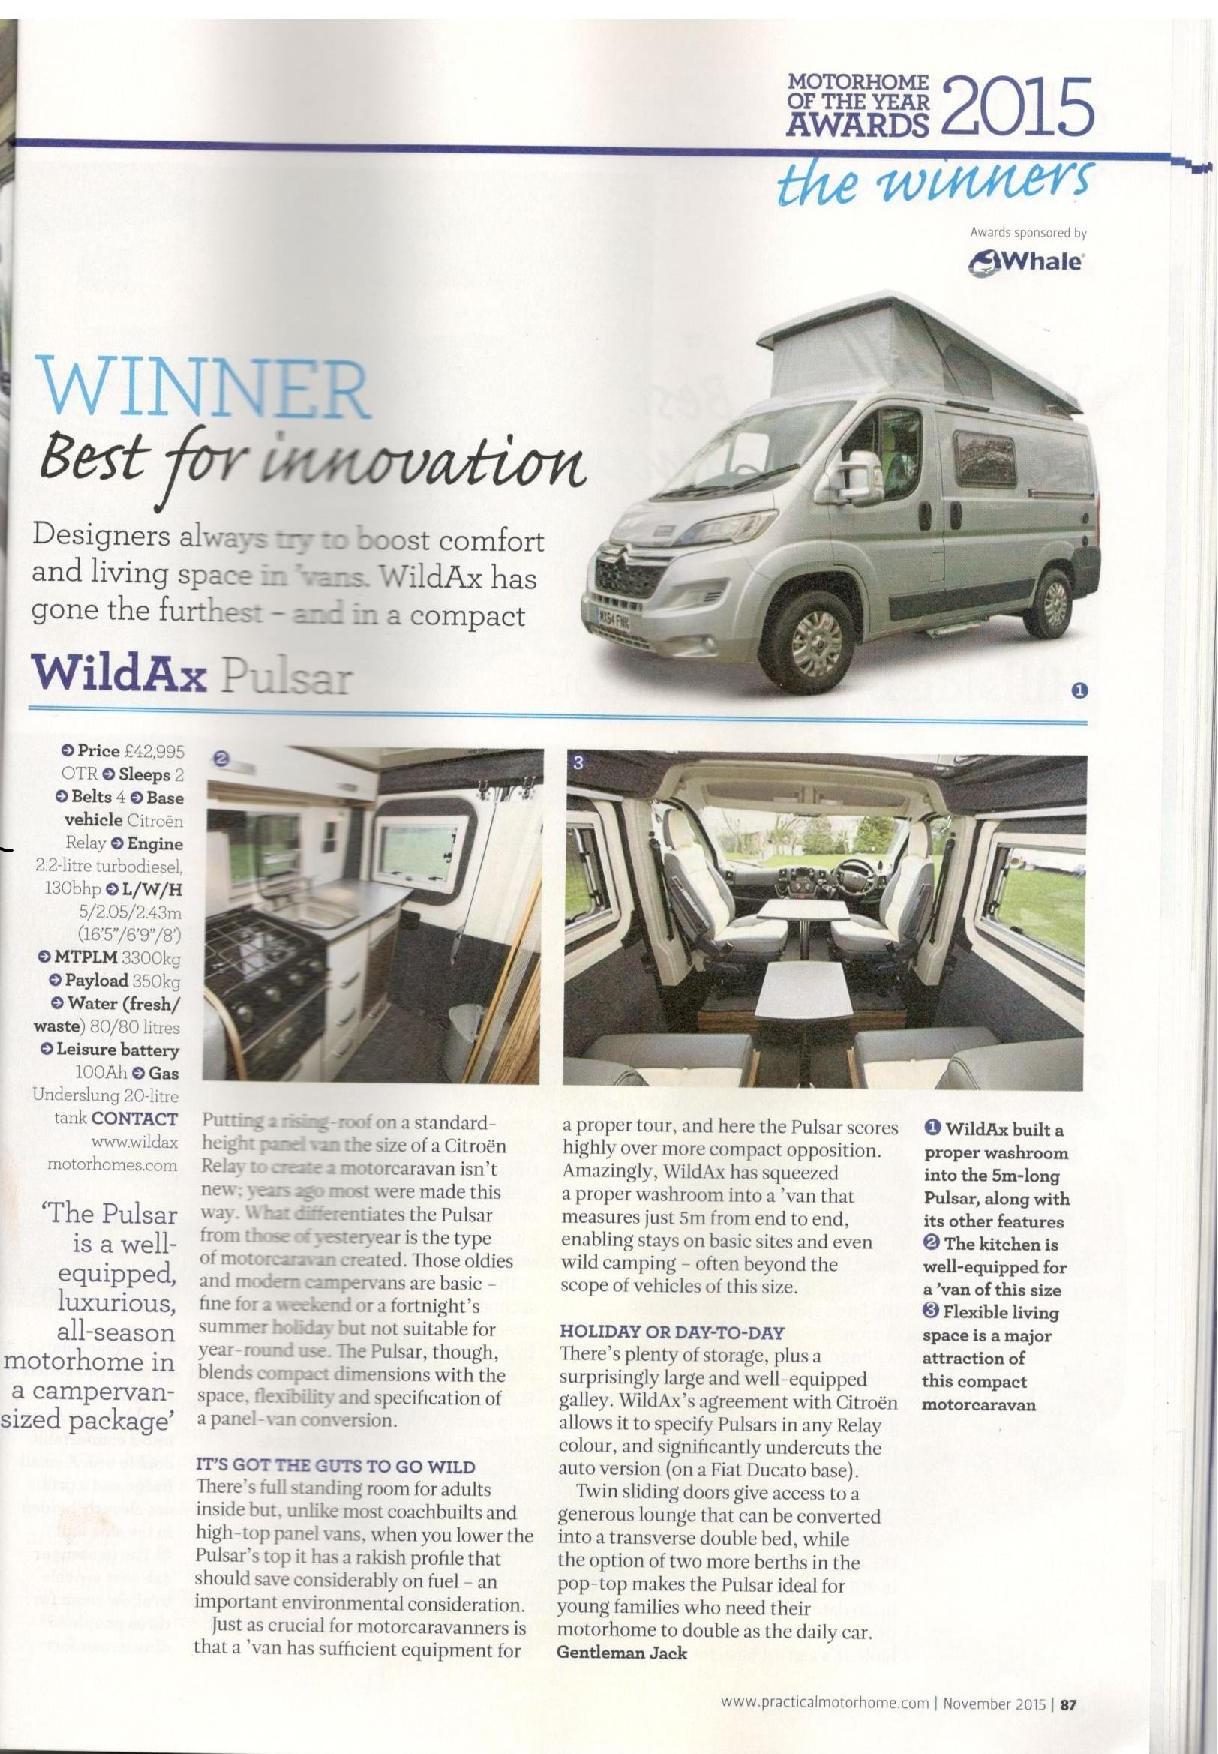 6e3e2603ce WildAx wins award - Practical Motorhomes 2015 Award for Best Innovation!